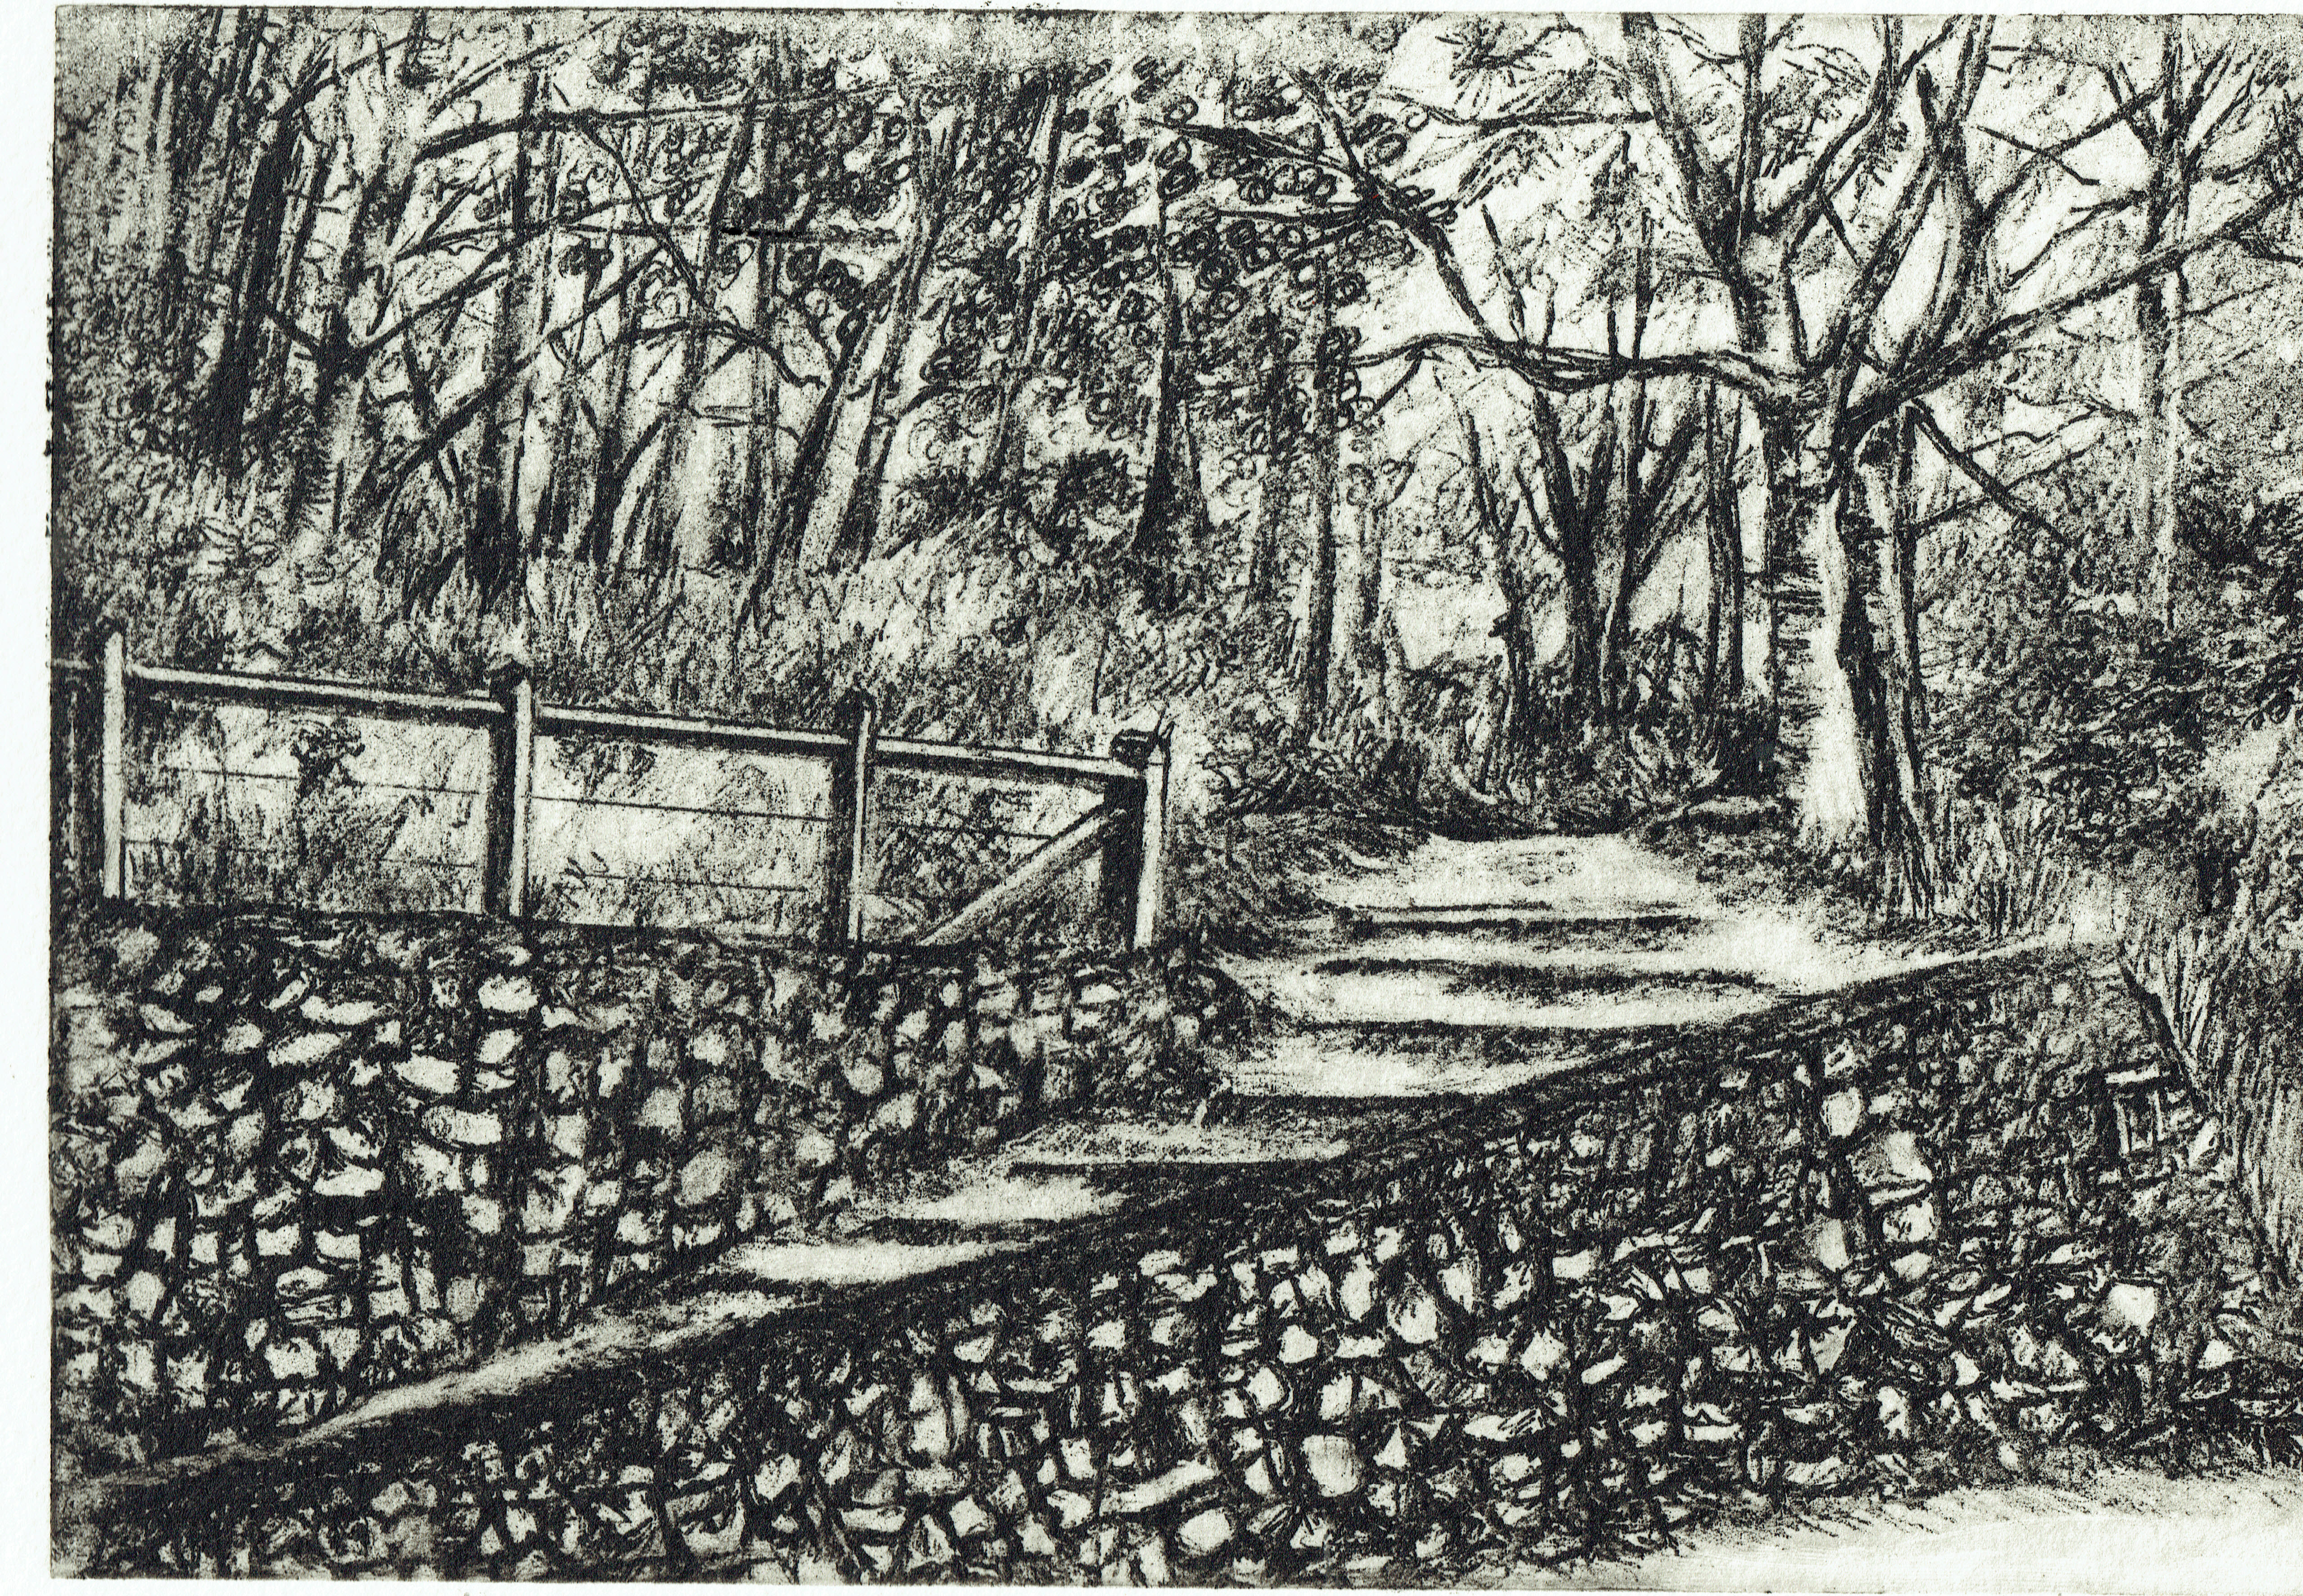 Julie Bignell Walking Trail-IntaglioOnPaper-33x26cm